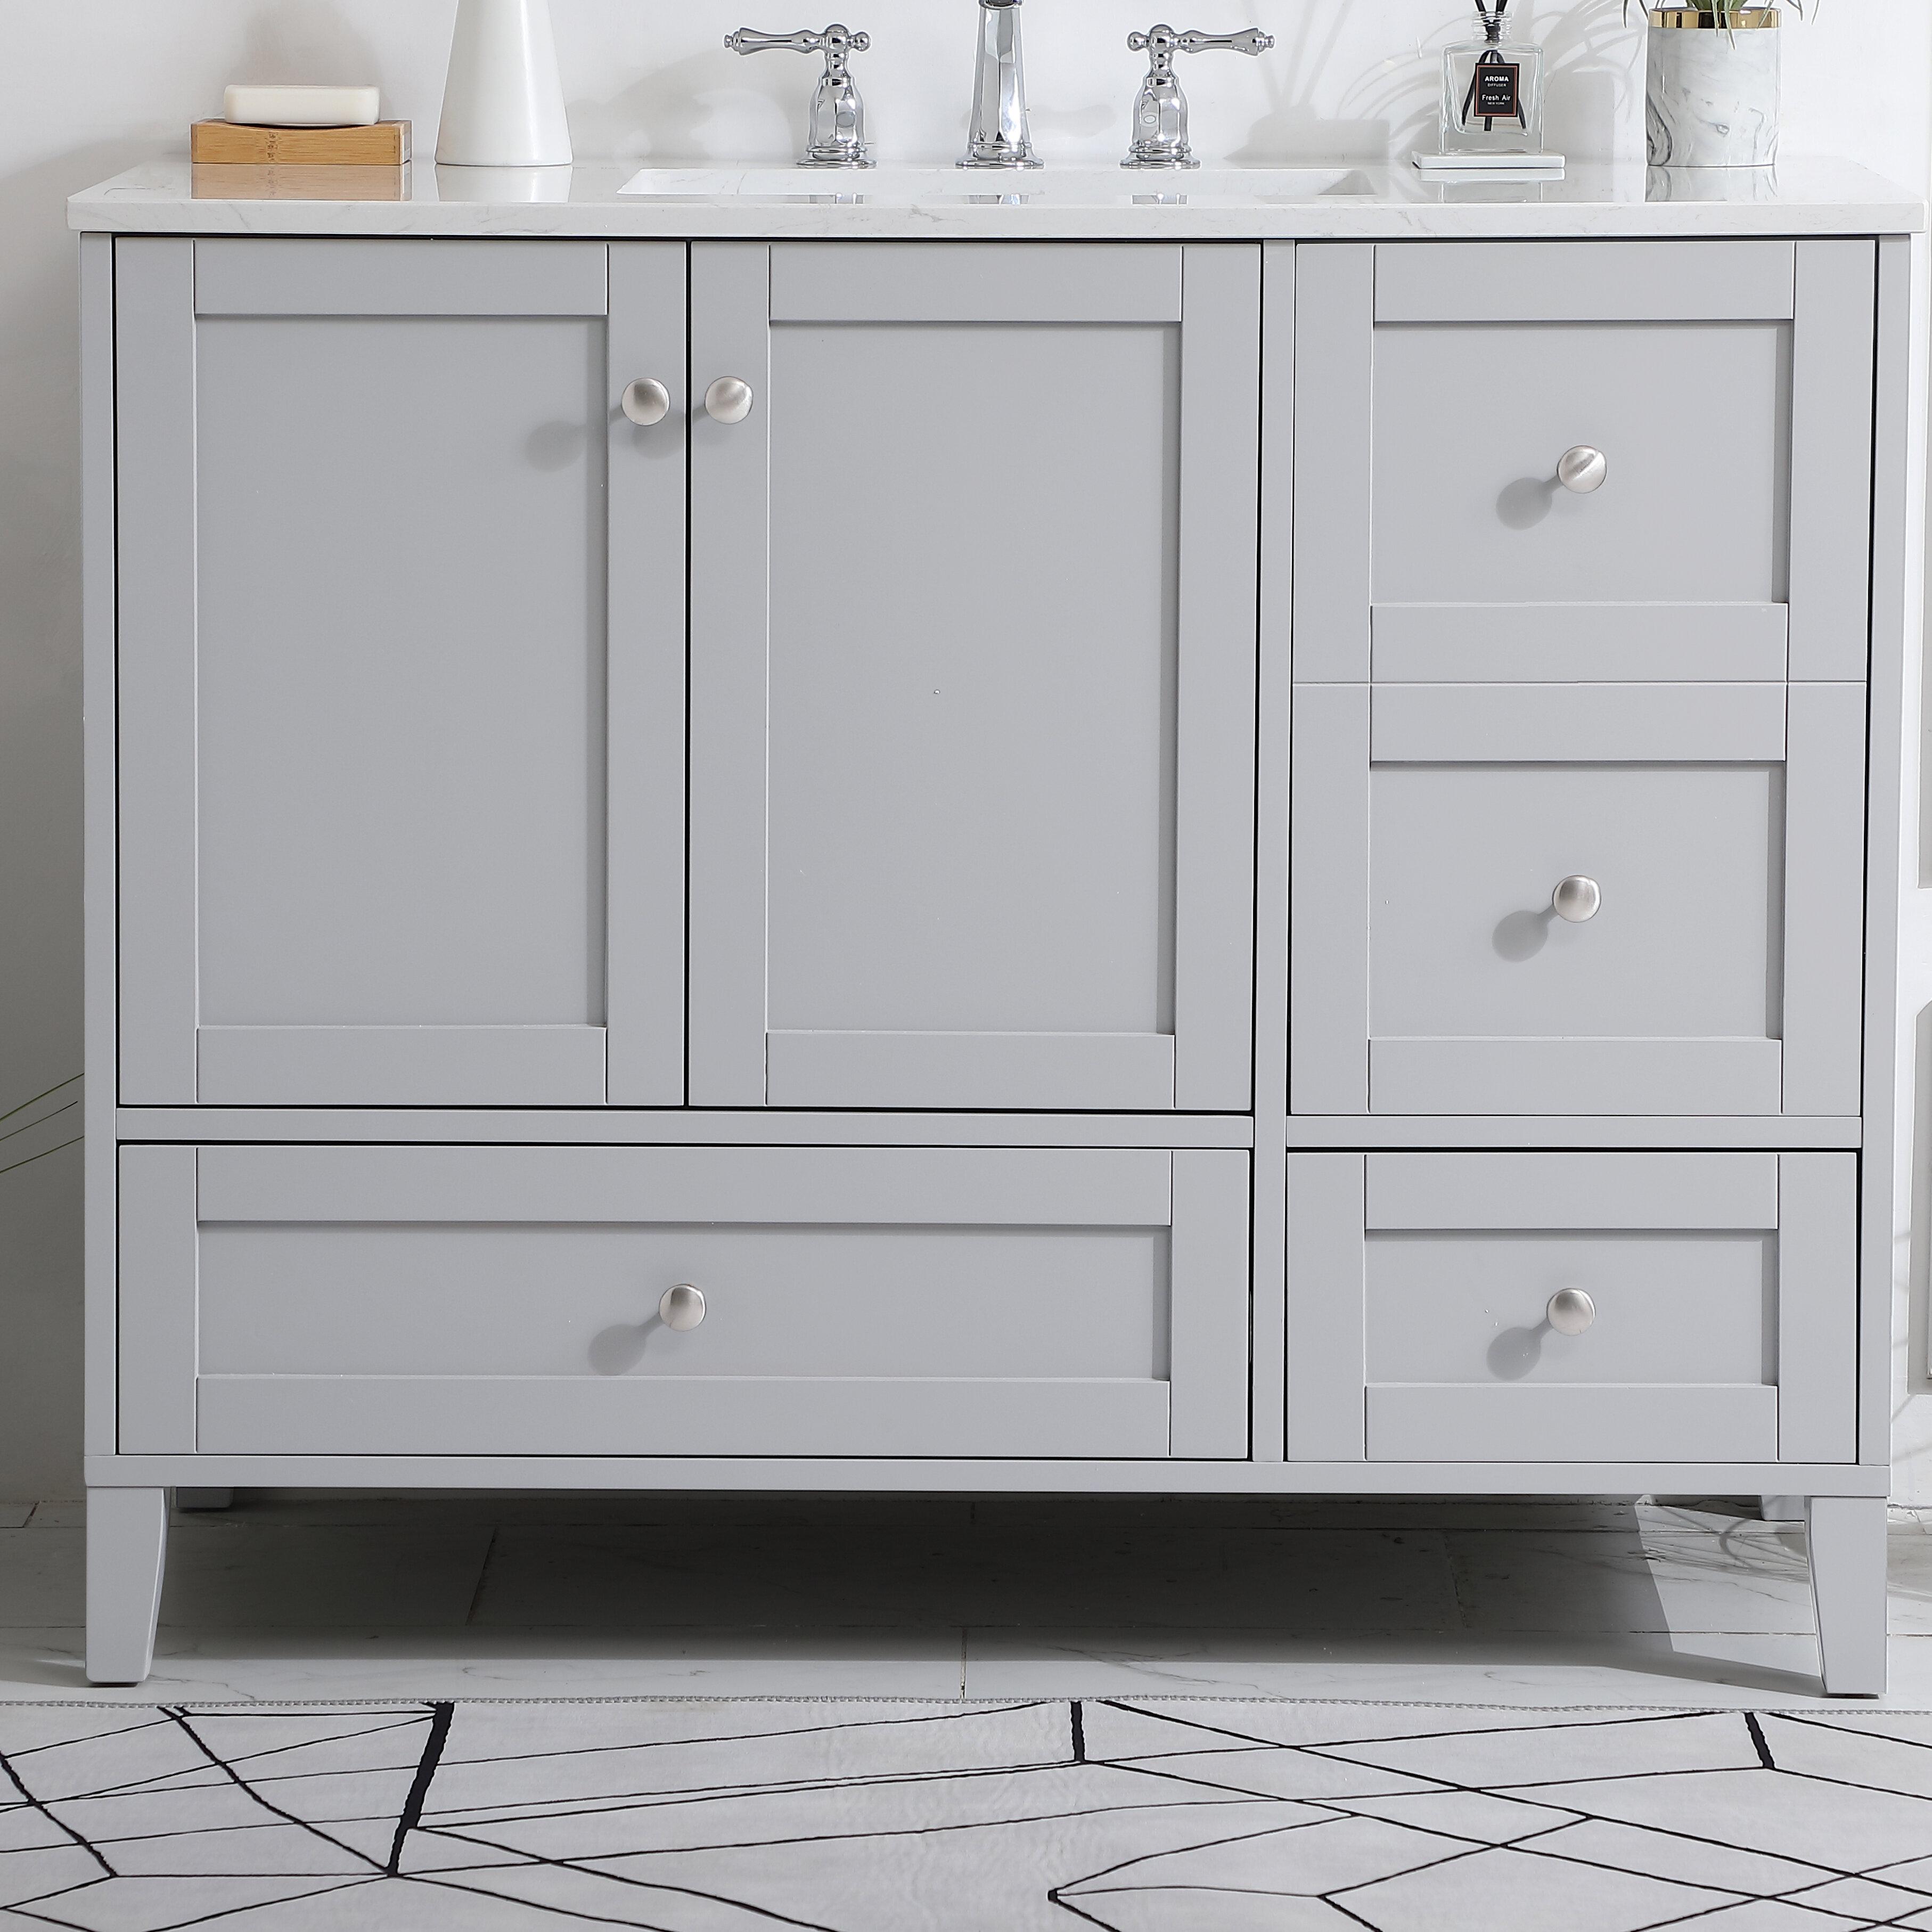 Beachcrest Home Araminta 42 Single Bathroom Vanity Set Reviews Wayfair